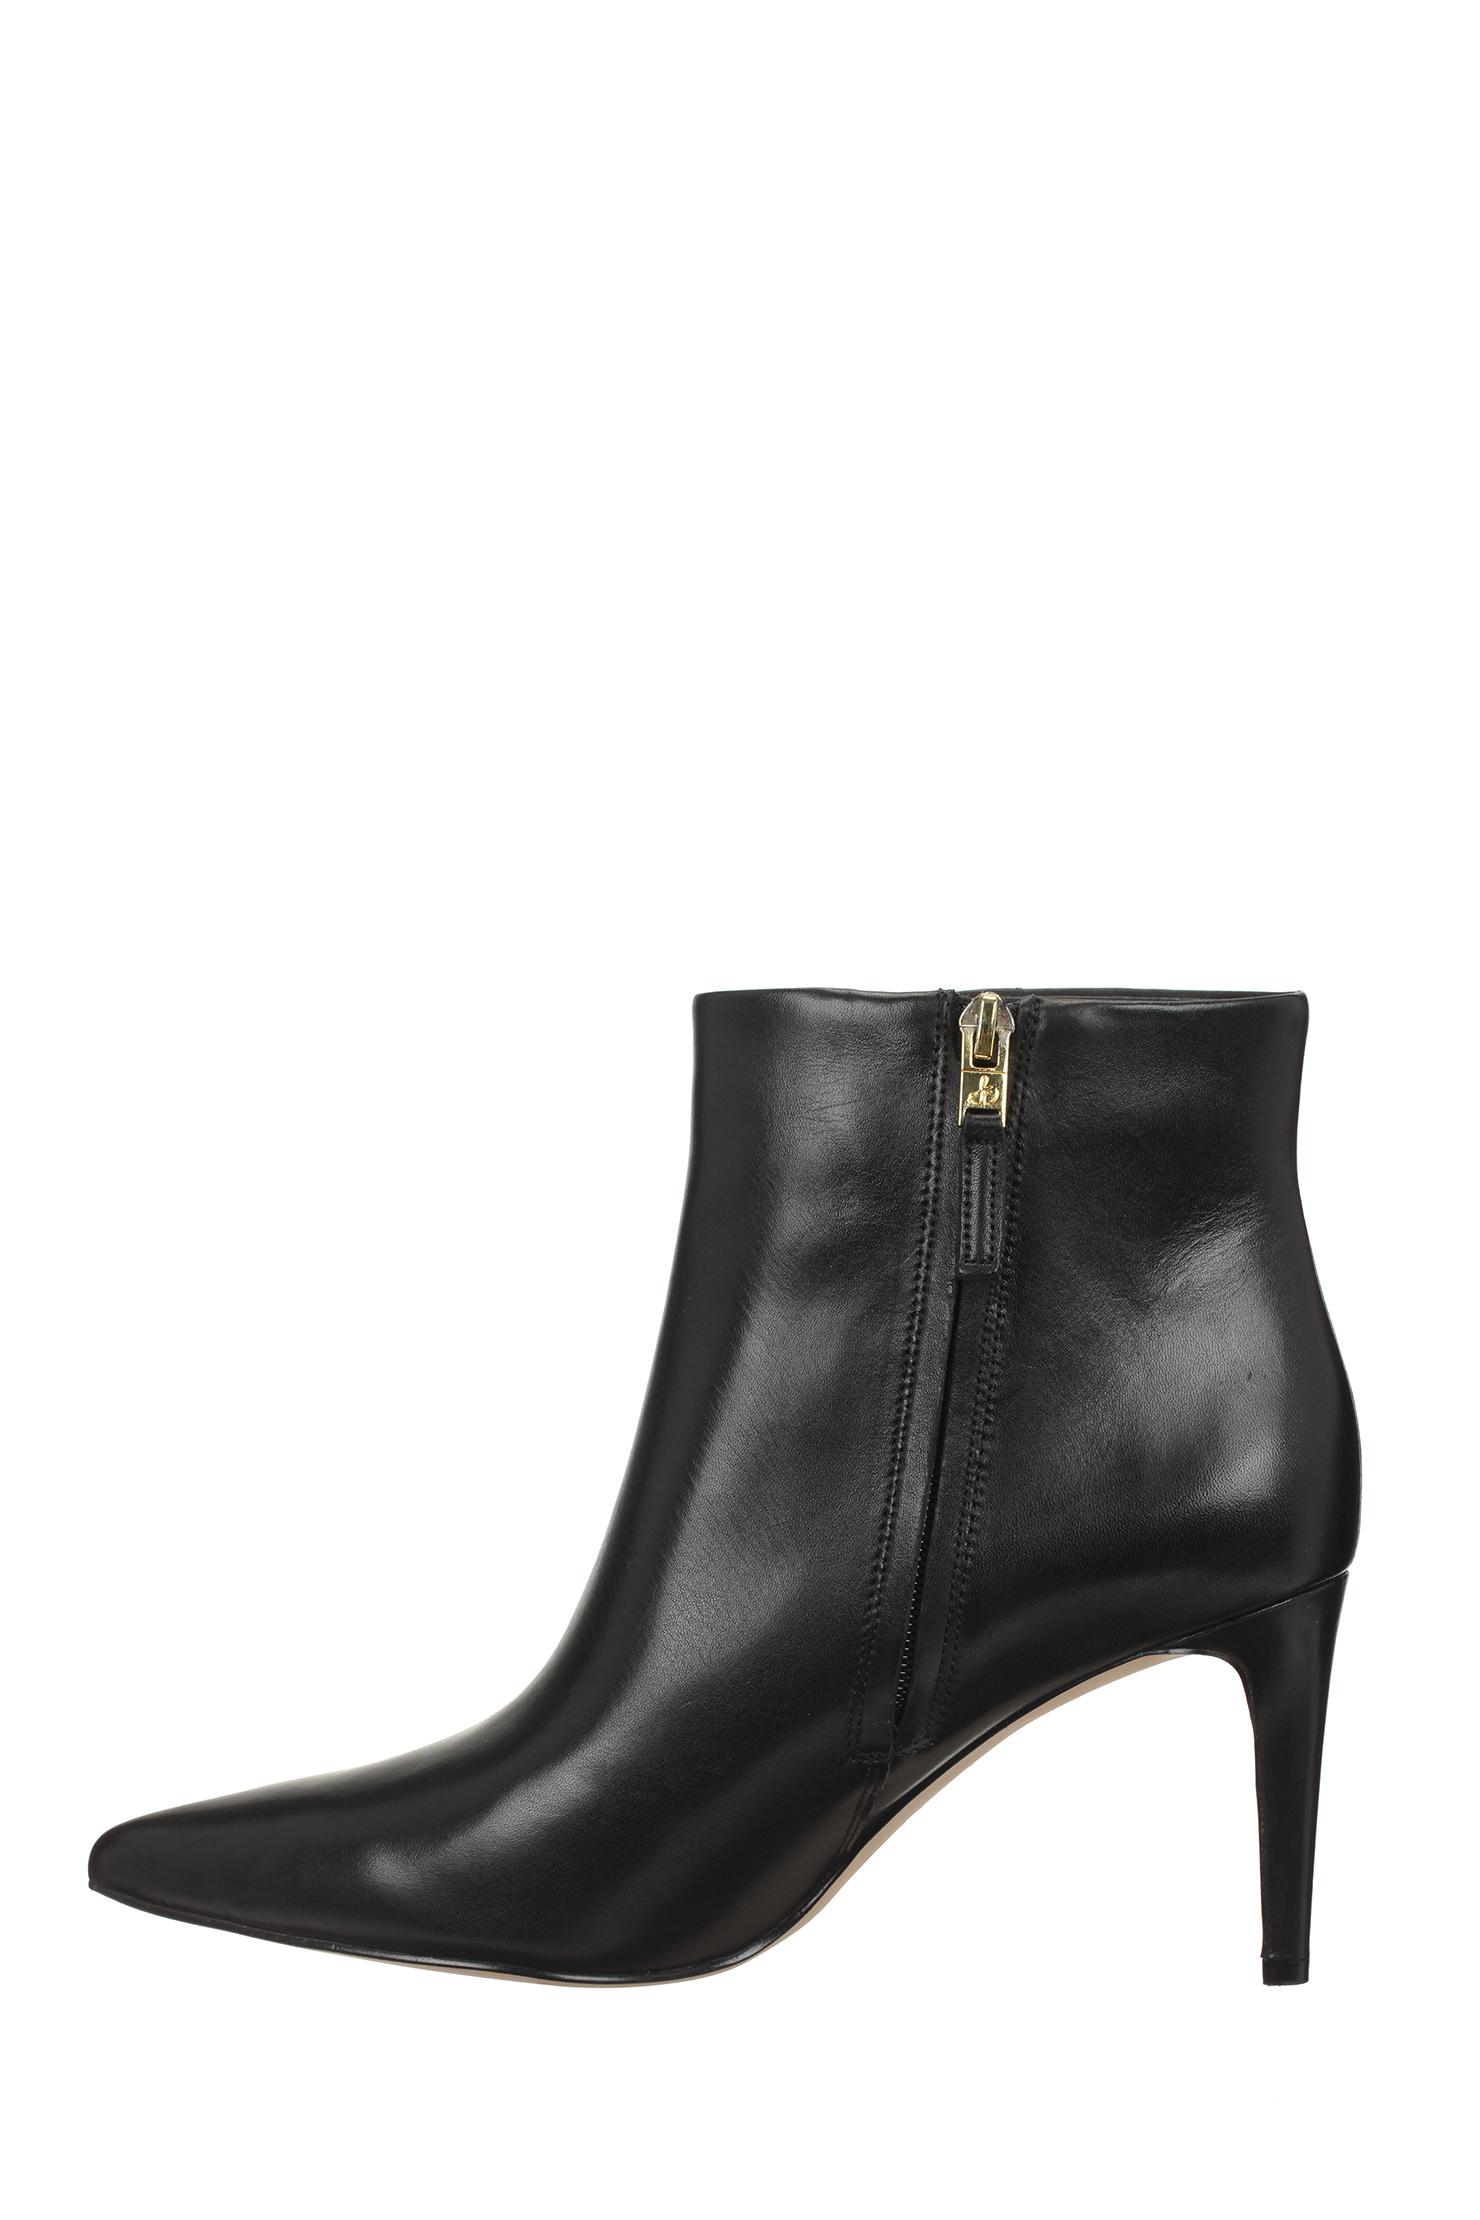 sam edelman boots in black lyst